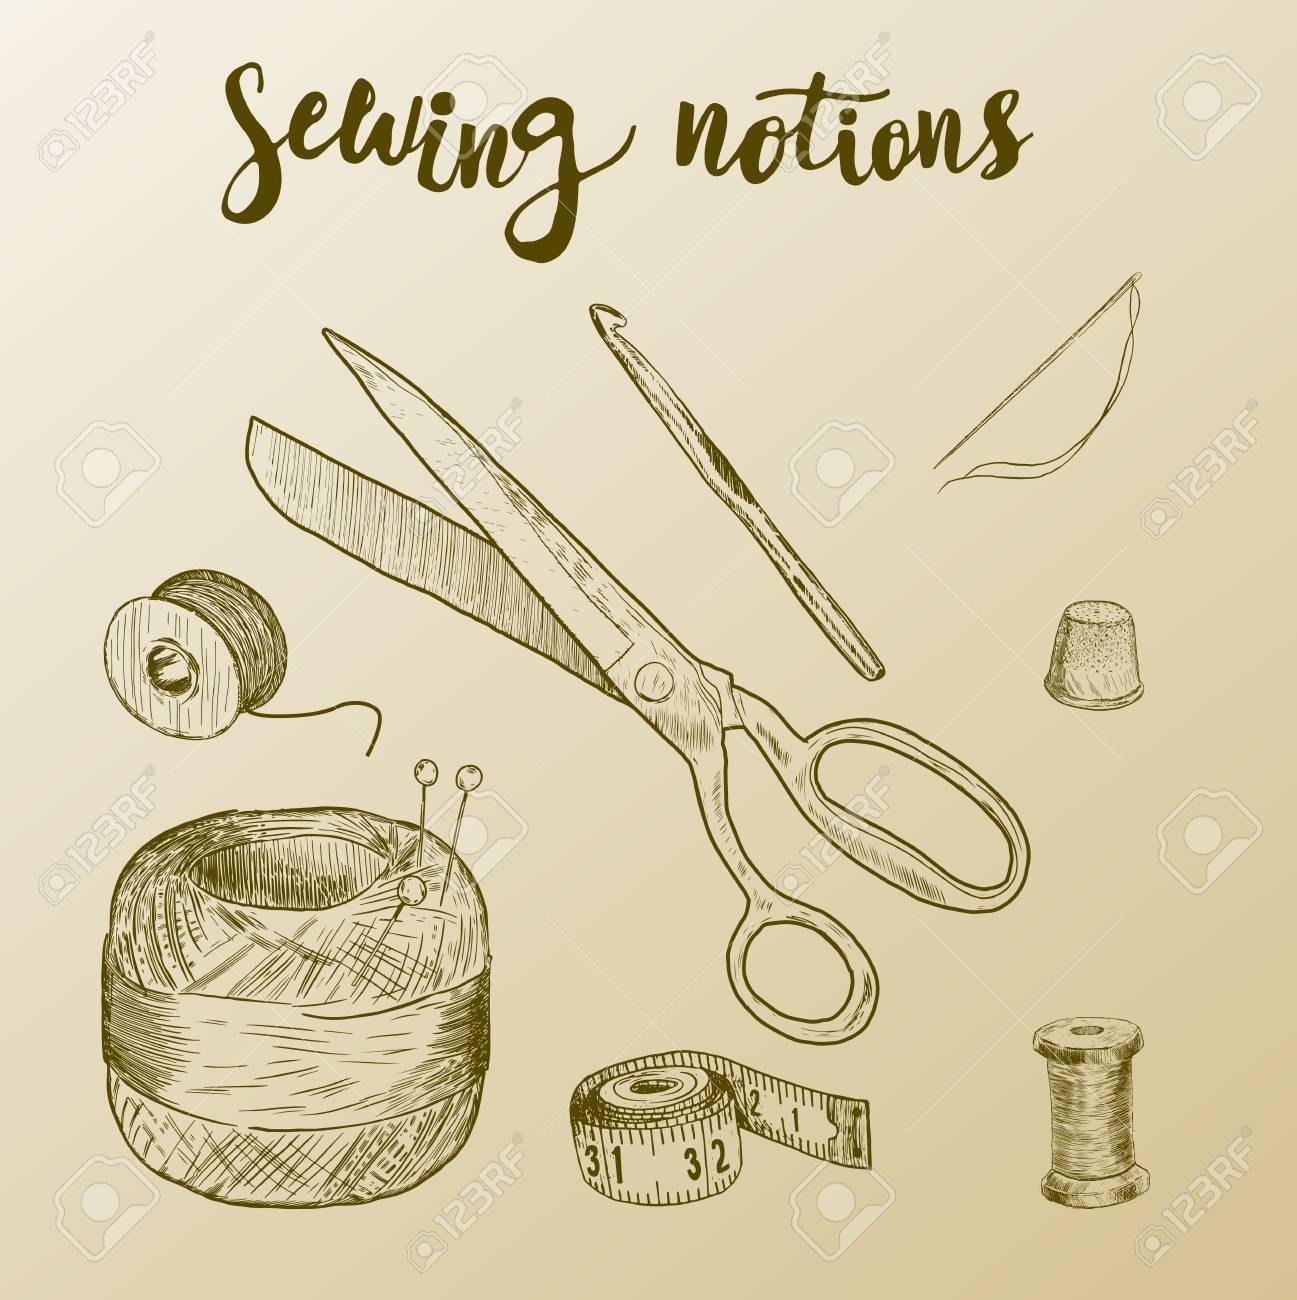 1297x1300 Sewing Notions. Hand Drawn Thread, Needle, Scissors, Ball